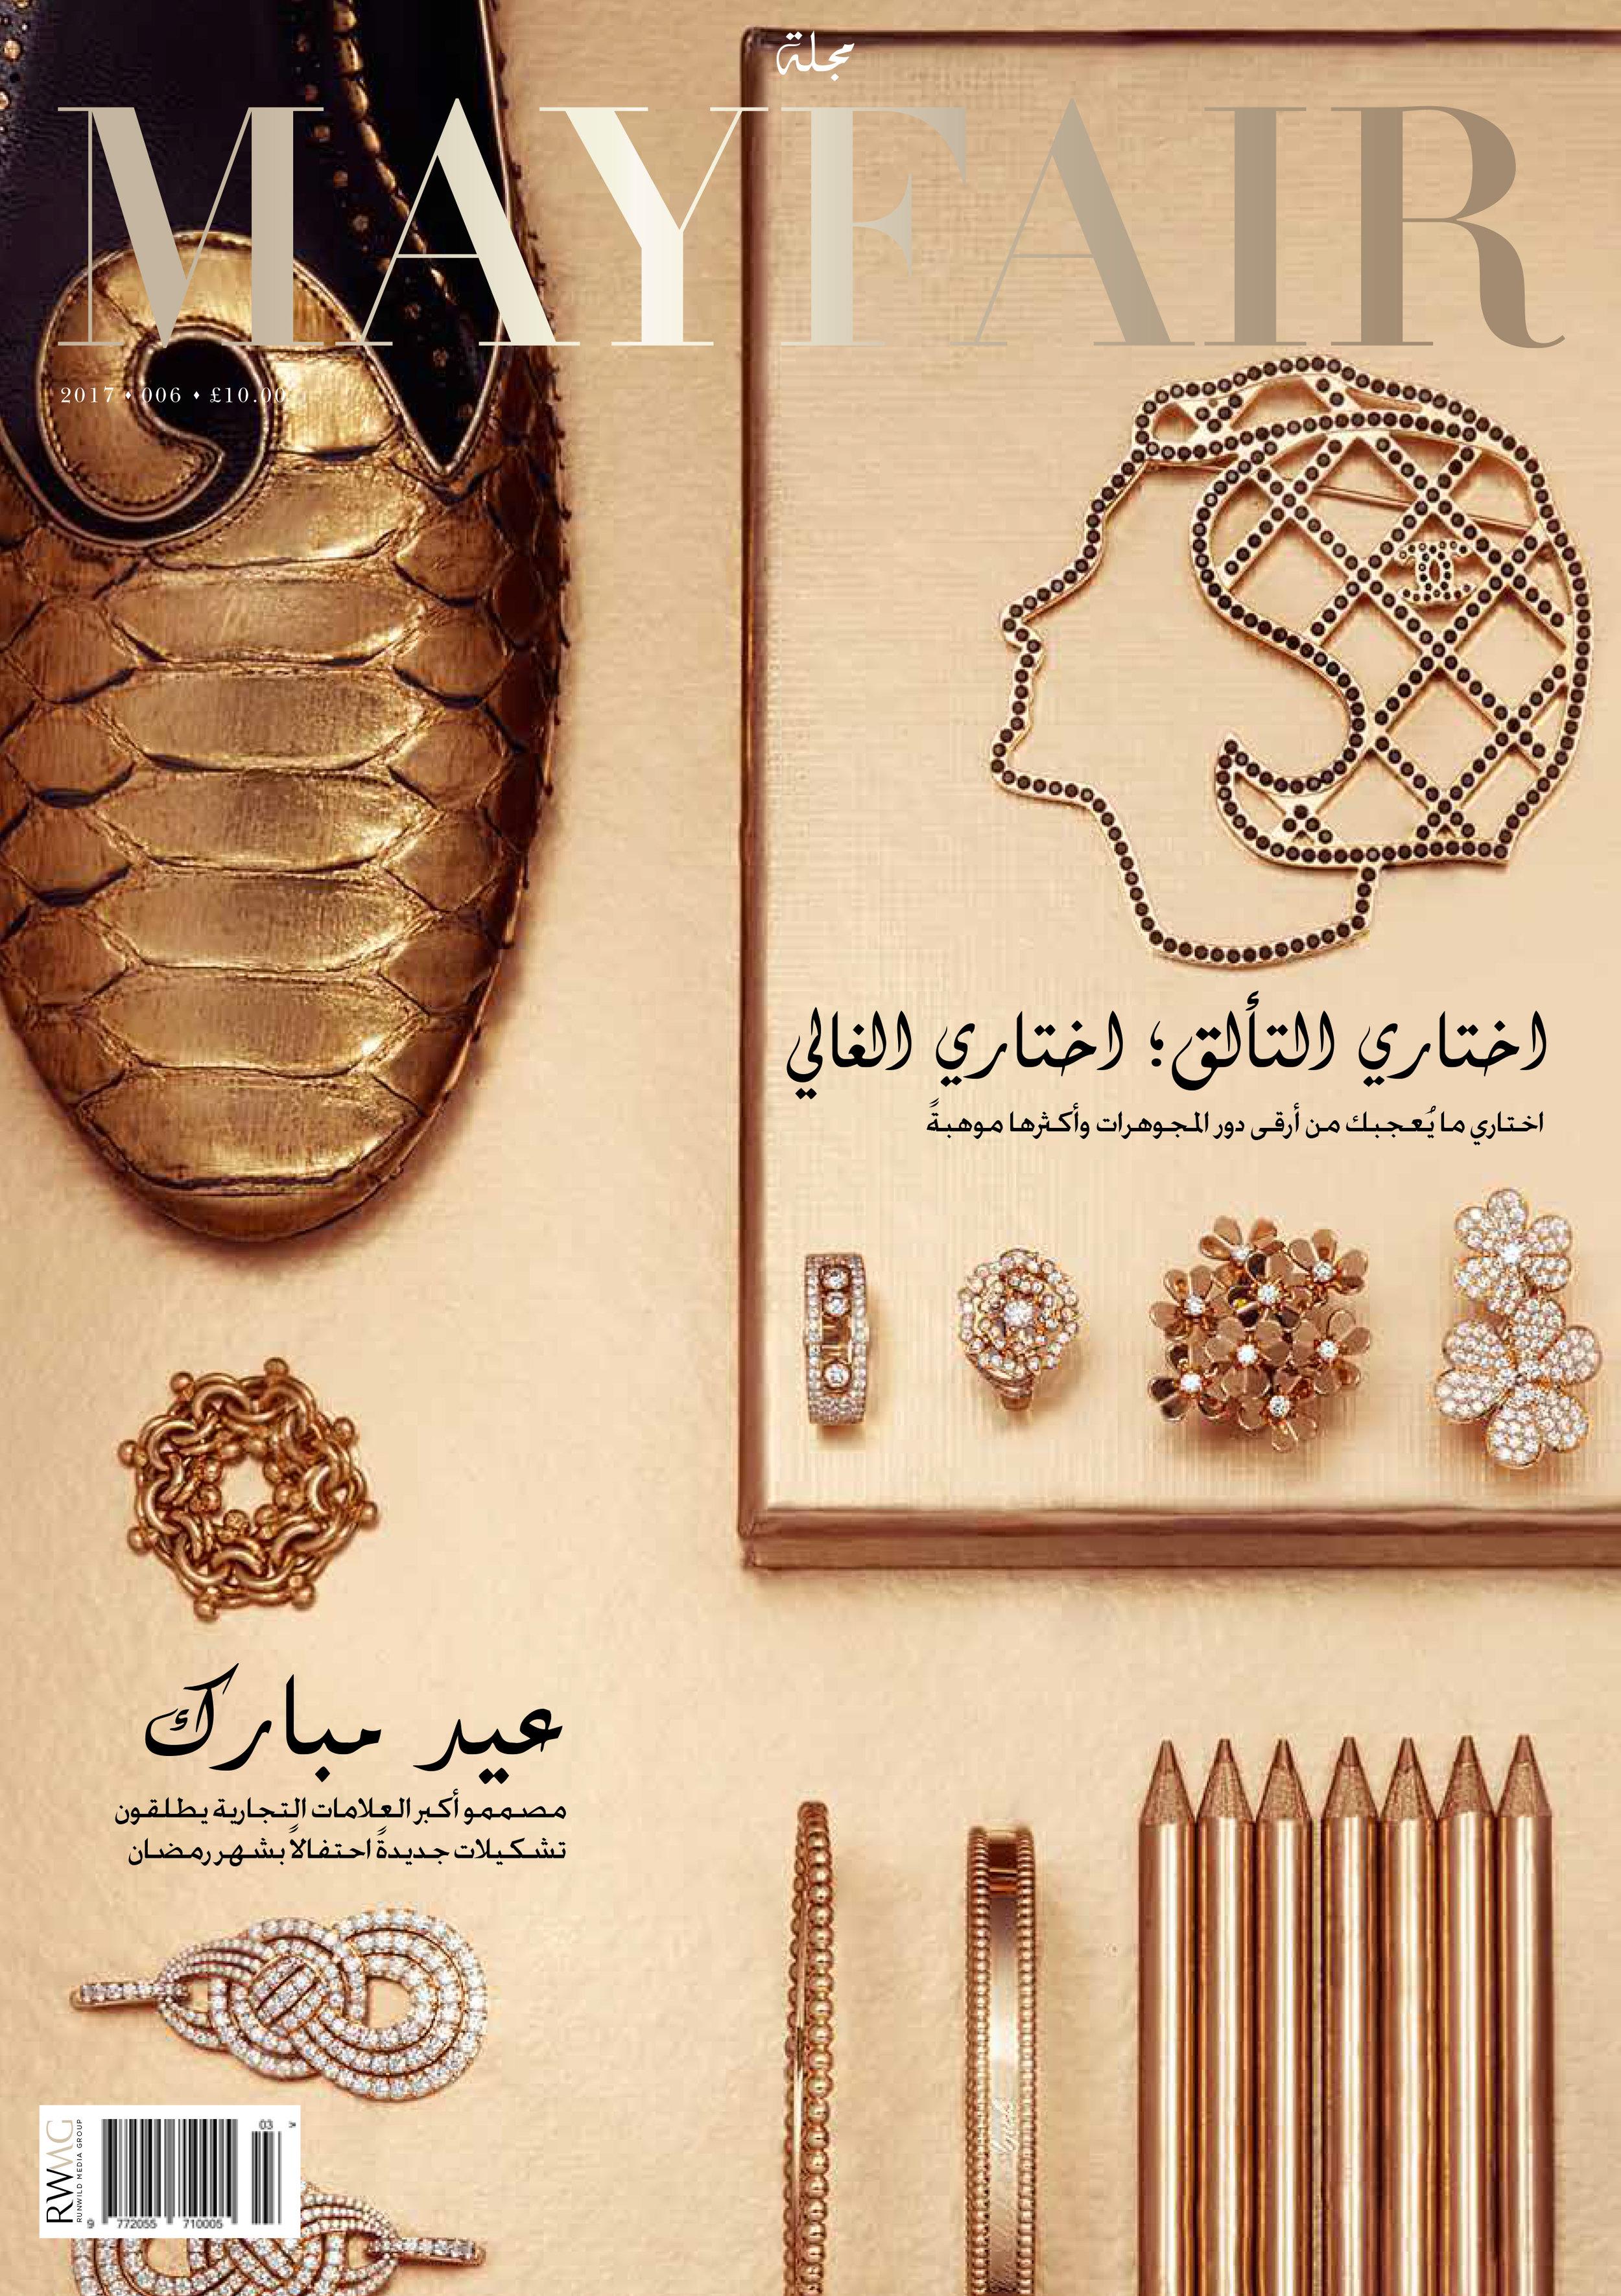 MAYF ARABIC JUN 17 REGULARS - COVER-3.jpg